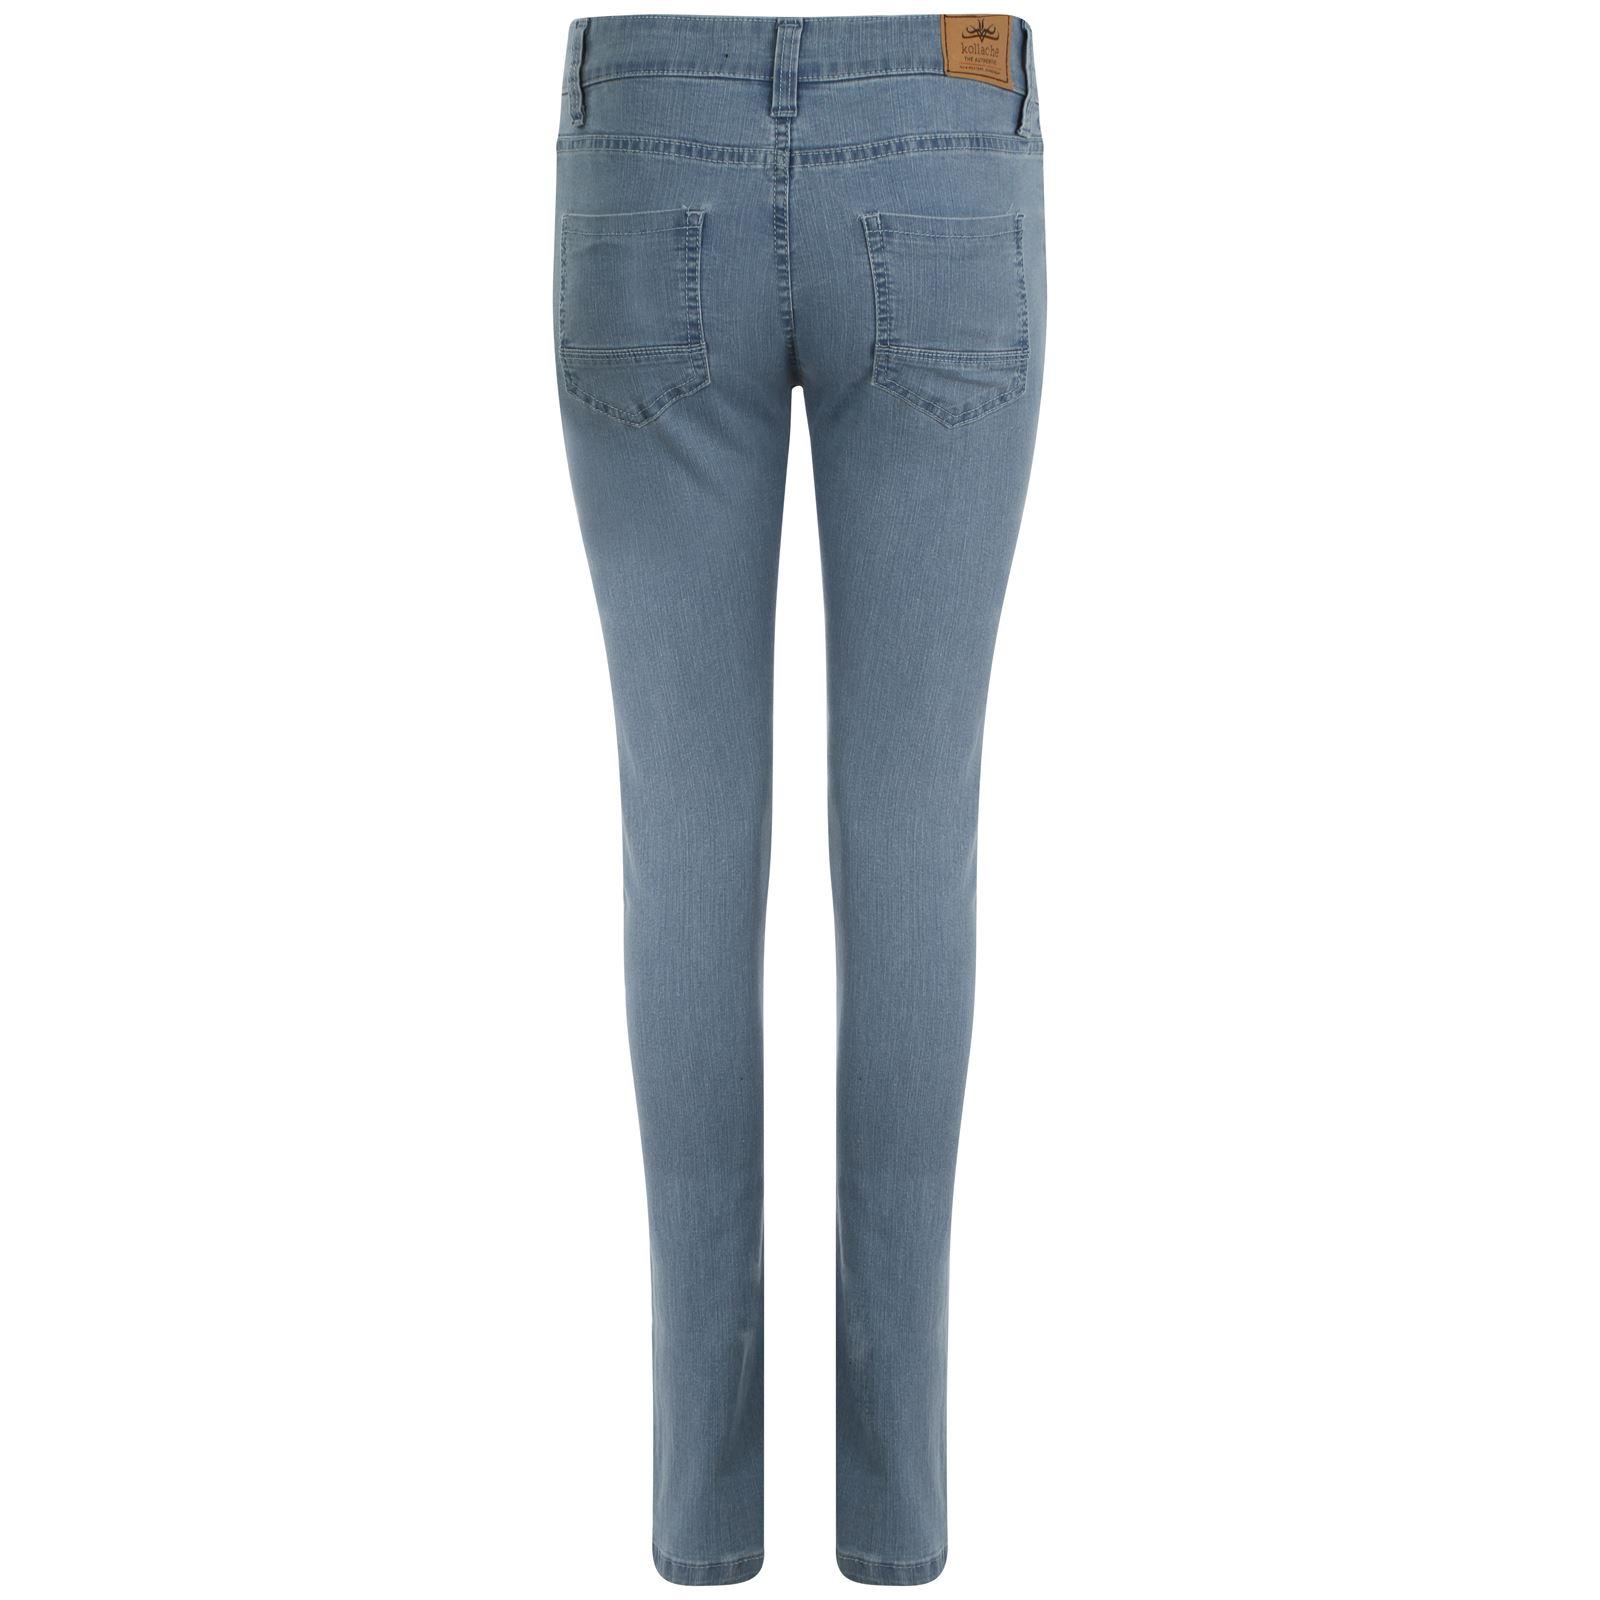 ladies womens slim straight regular fit denim jeans girls stretchy trousers new ebay. Black Bedroom Furniture Sets. Home Design Ideas